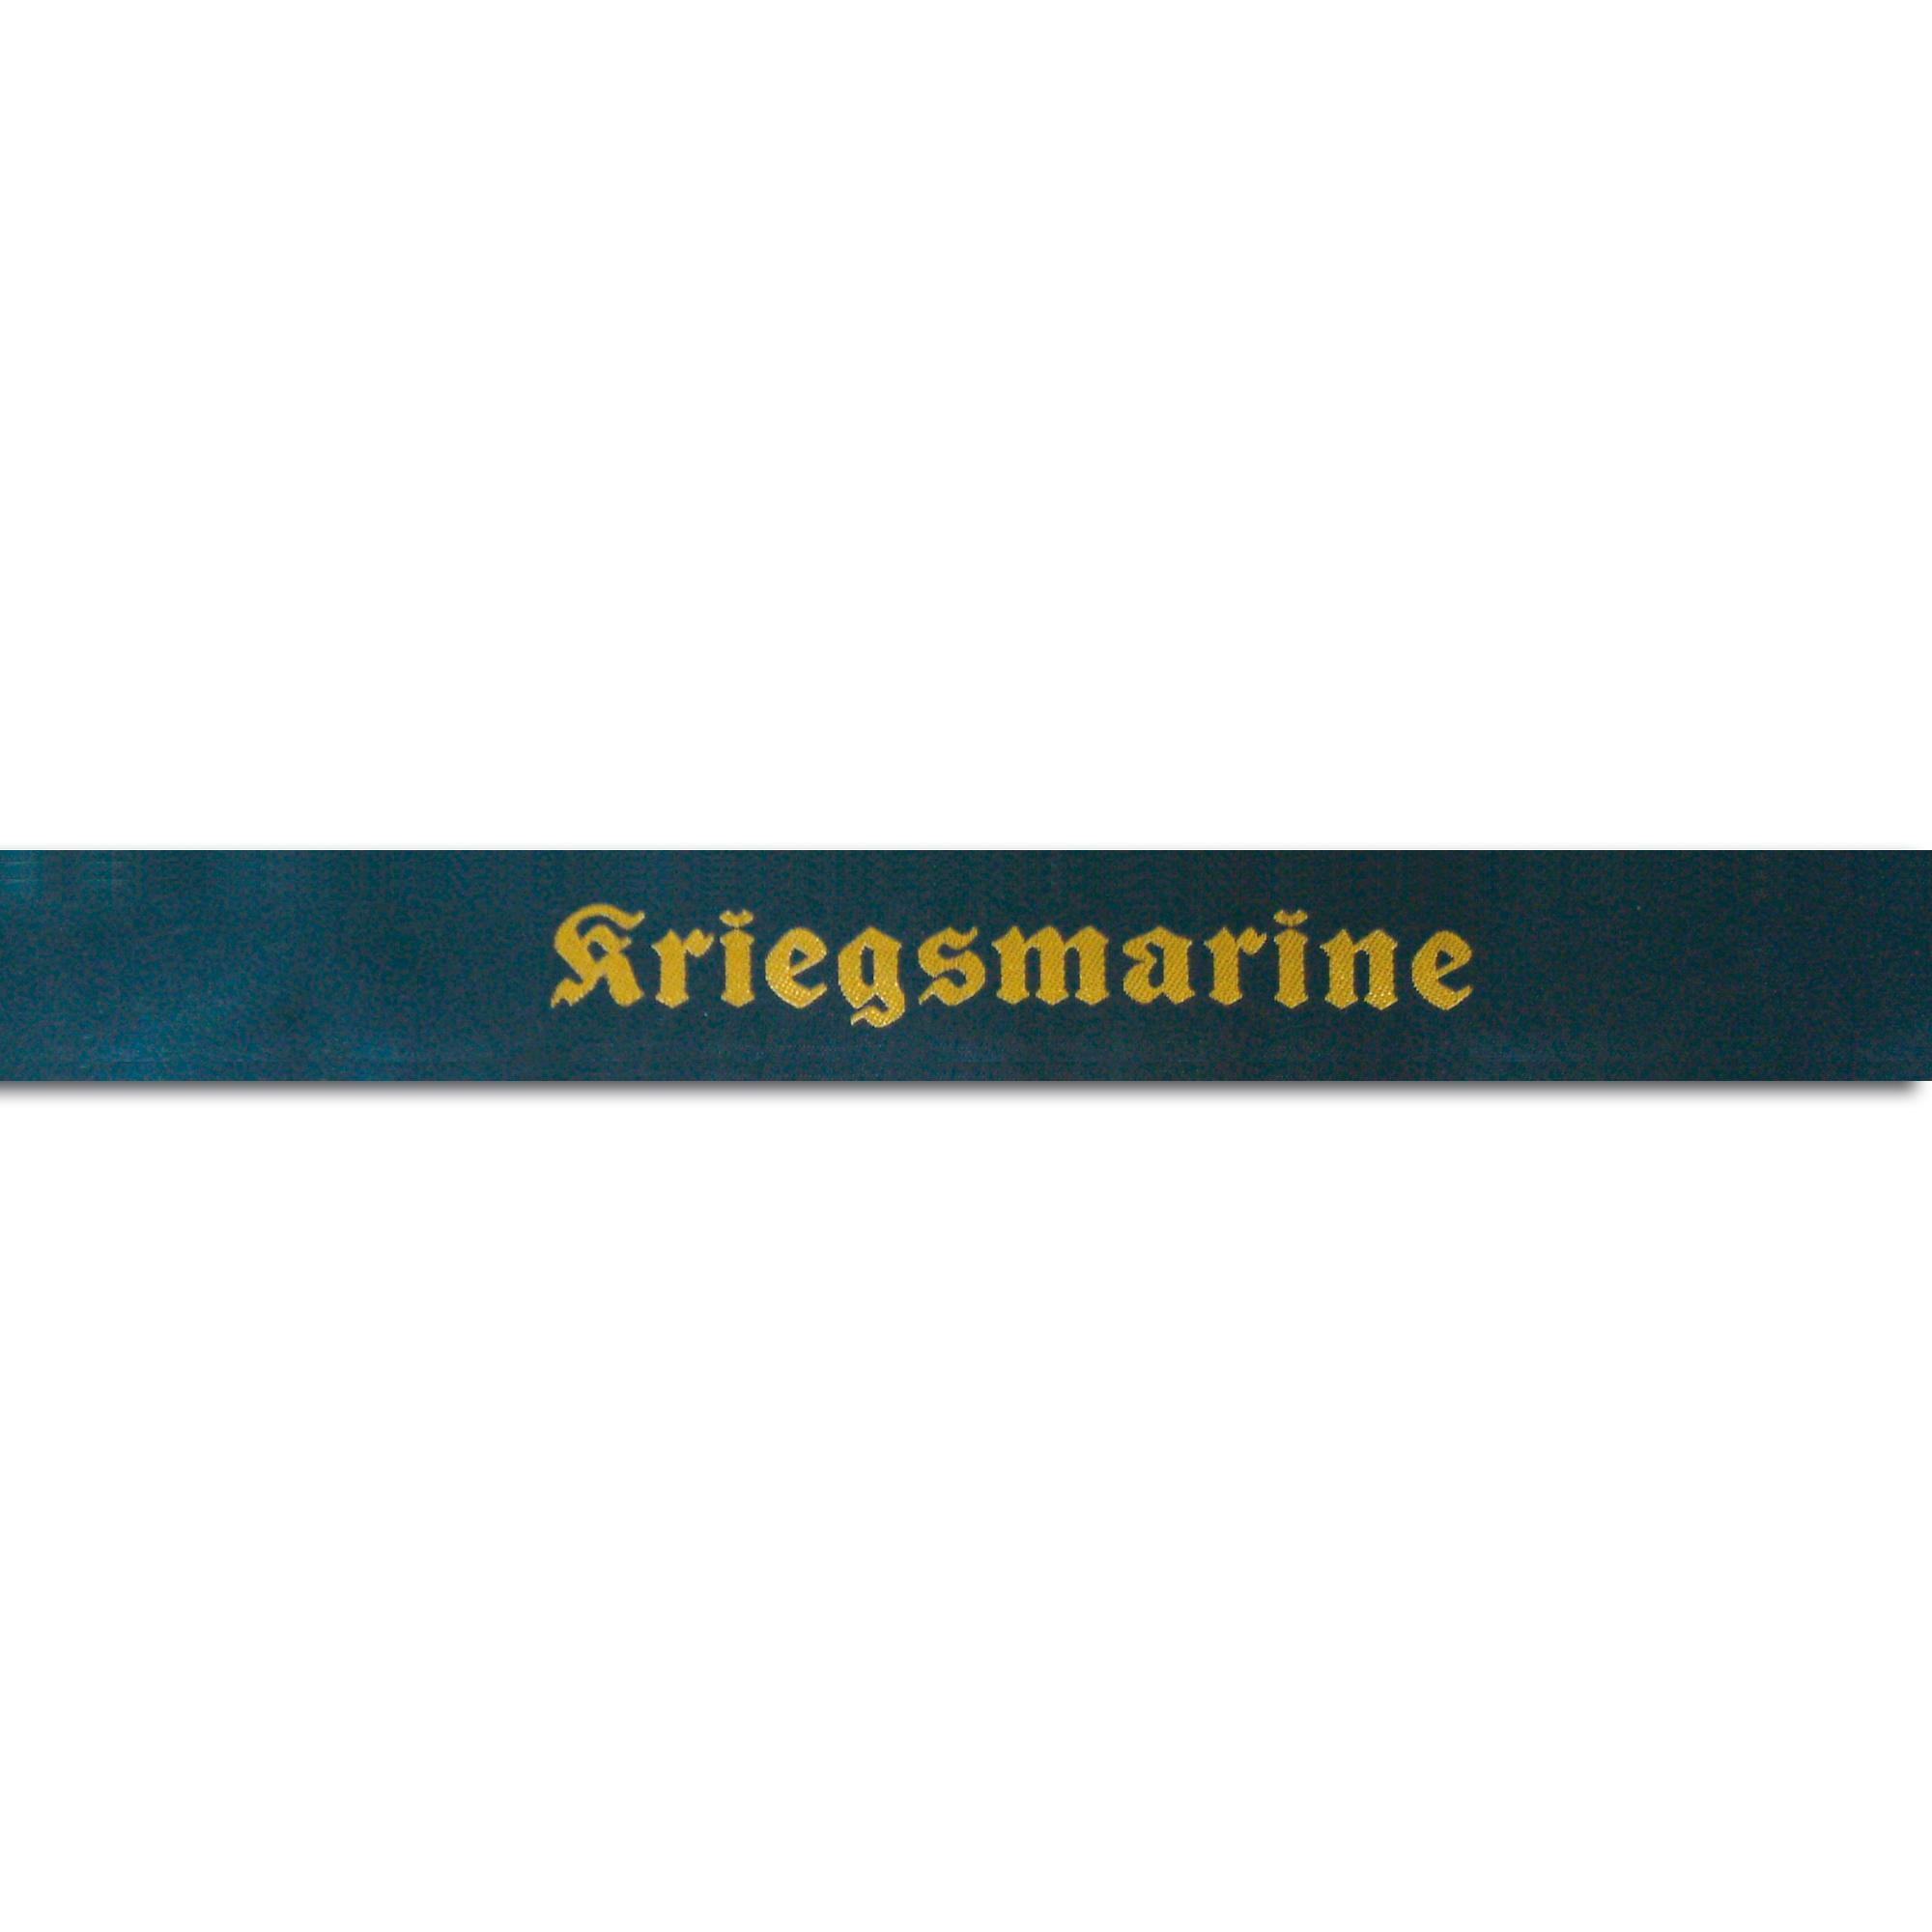 Hat Band German Navy (Kriegsmarine)